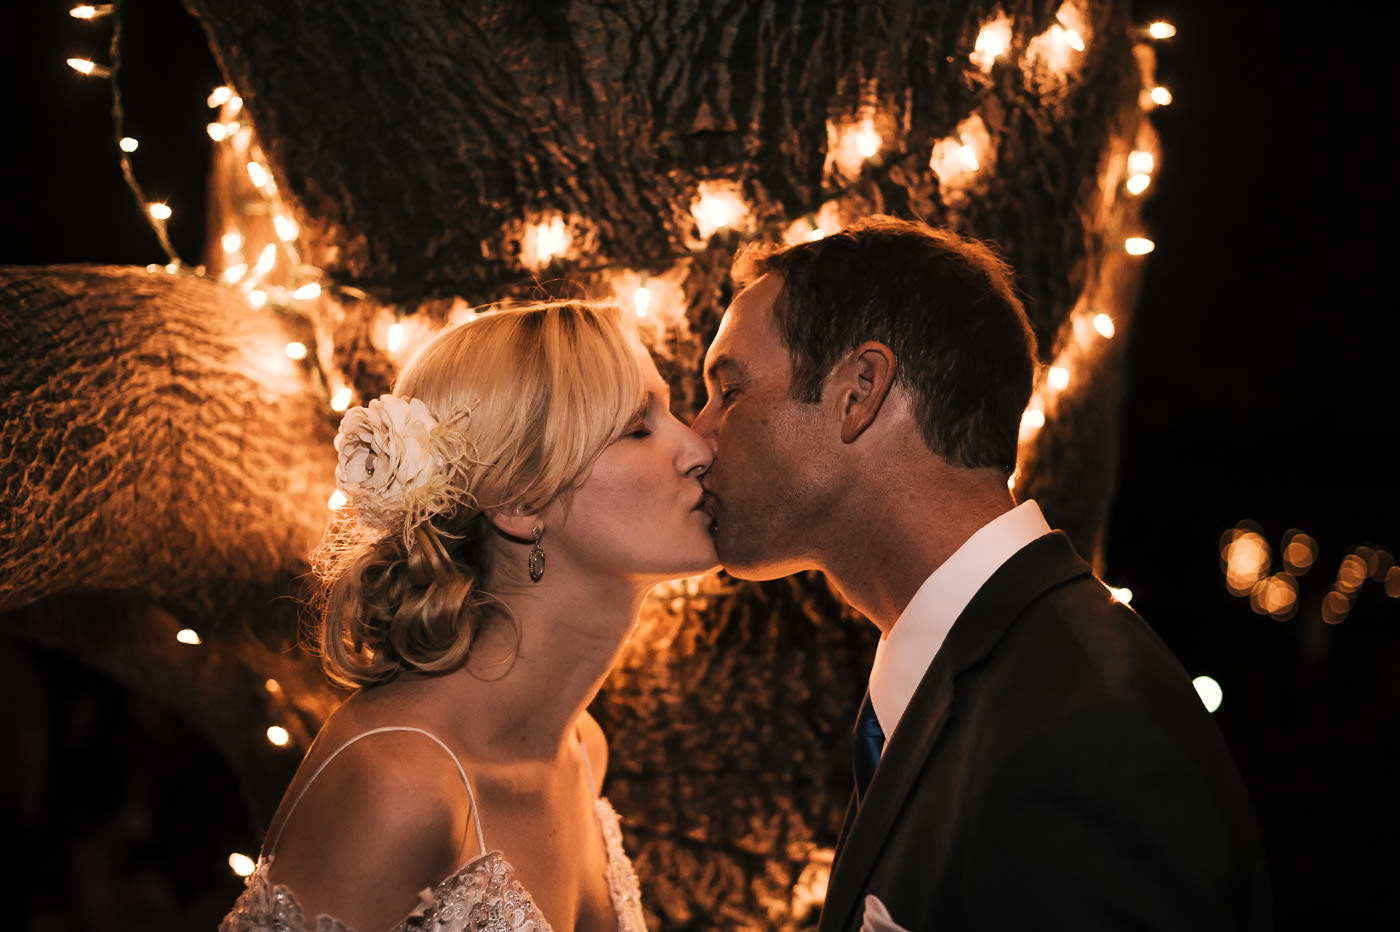 romantic kiss under the oak tree lit by string lights at whispering oaks terrace